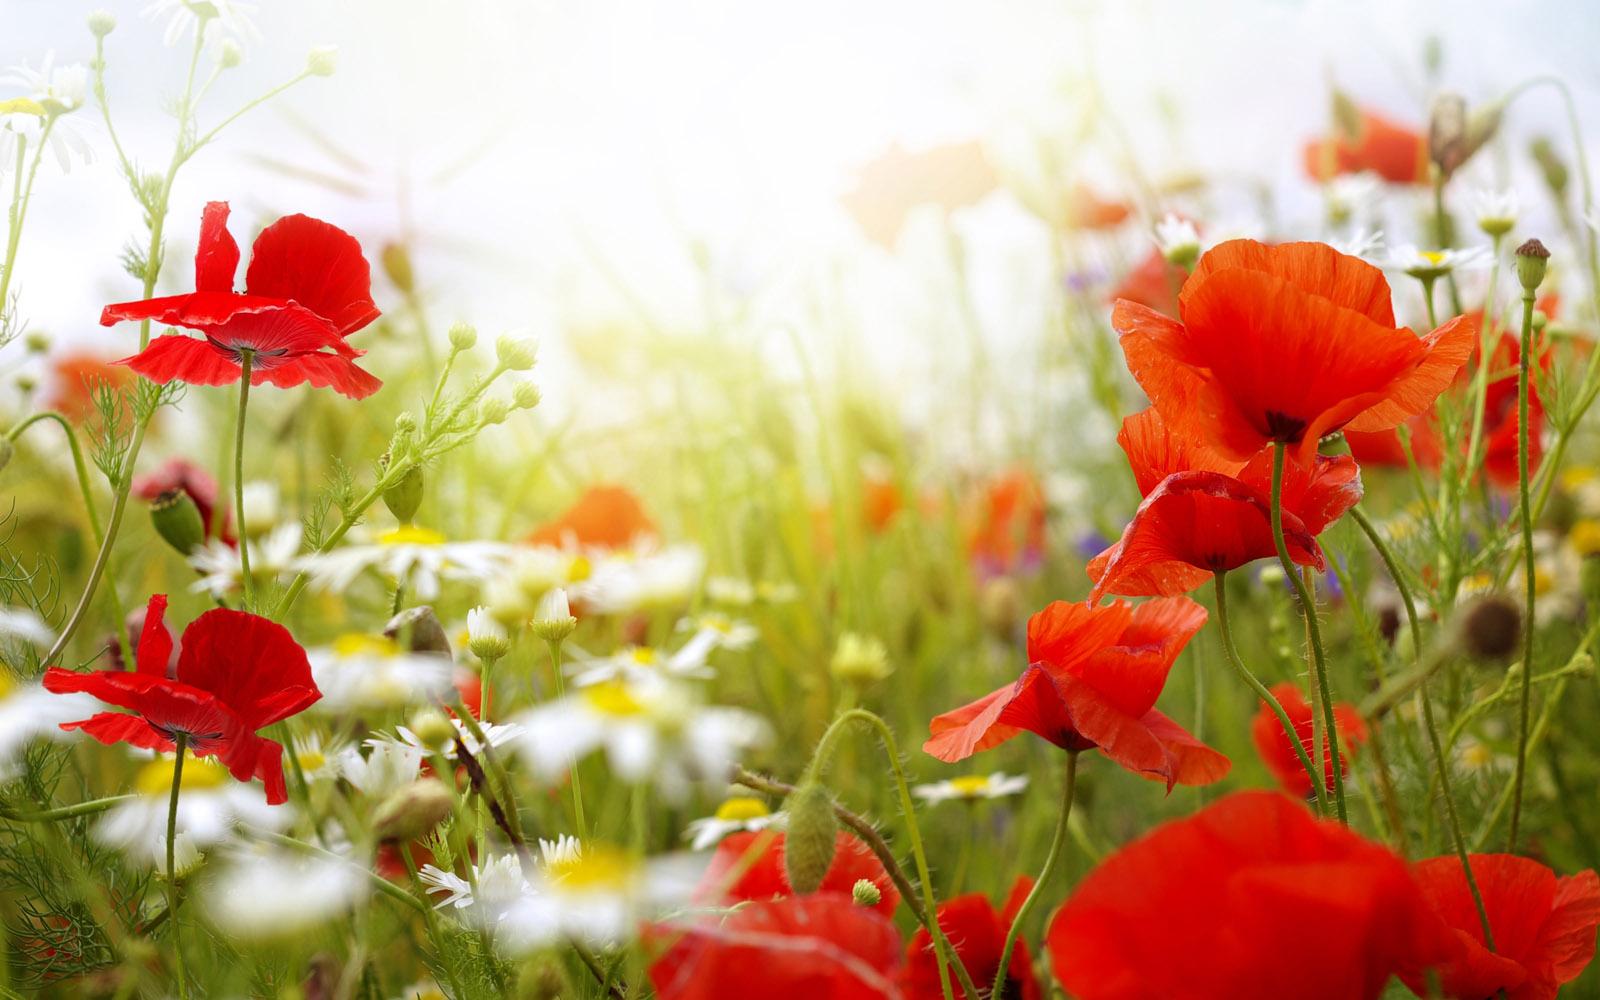 Spring Flowers Wallpaper Hd Desktop Widescreen For Mobile Tumblr 1600x1000